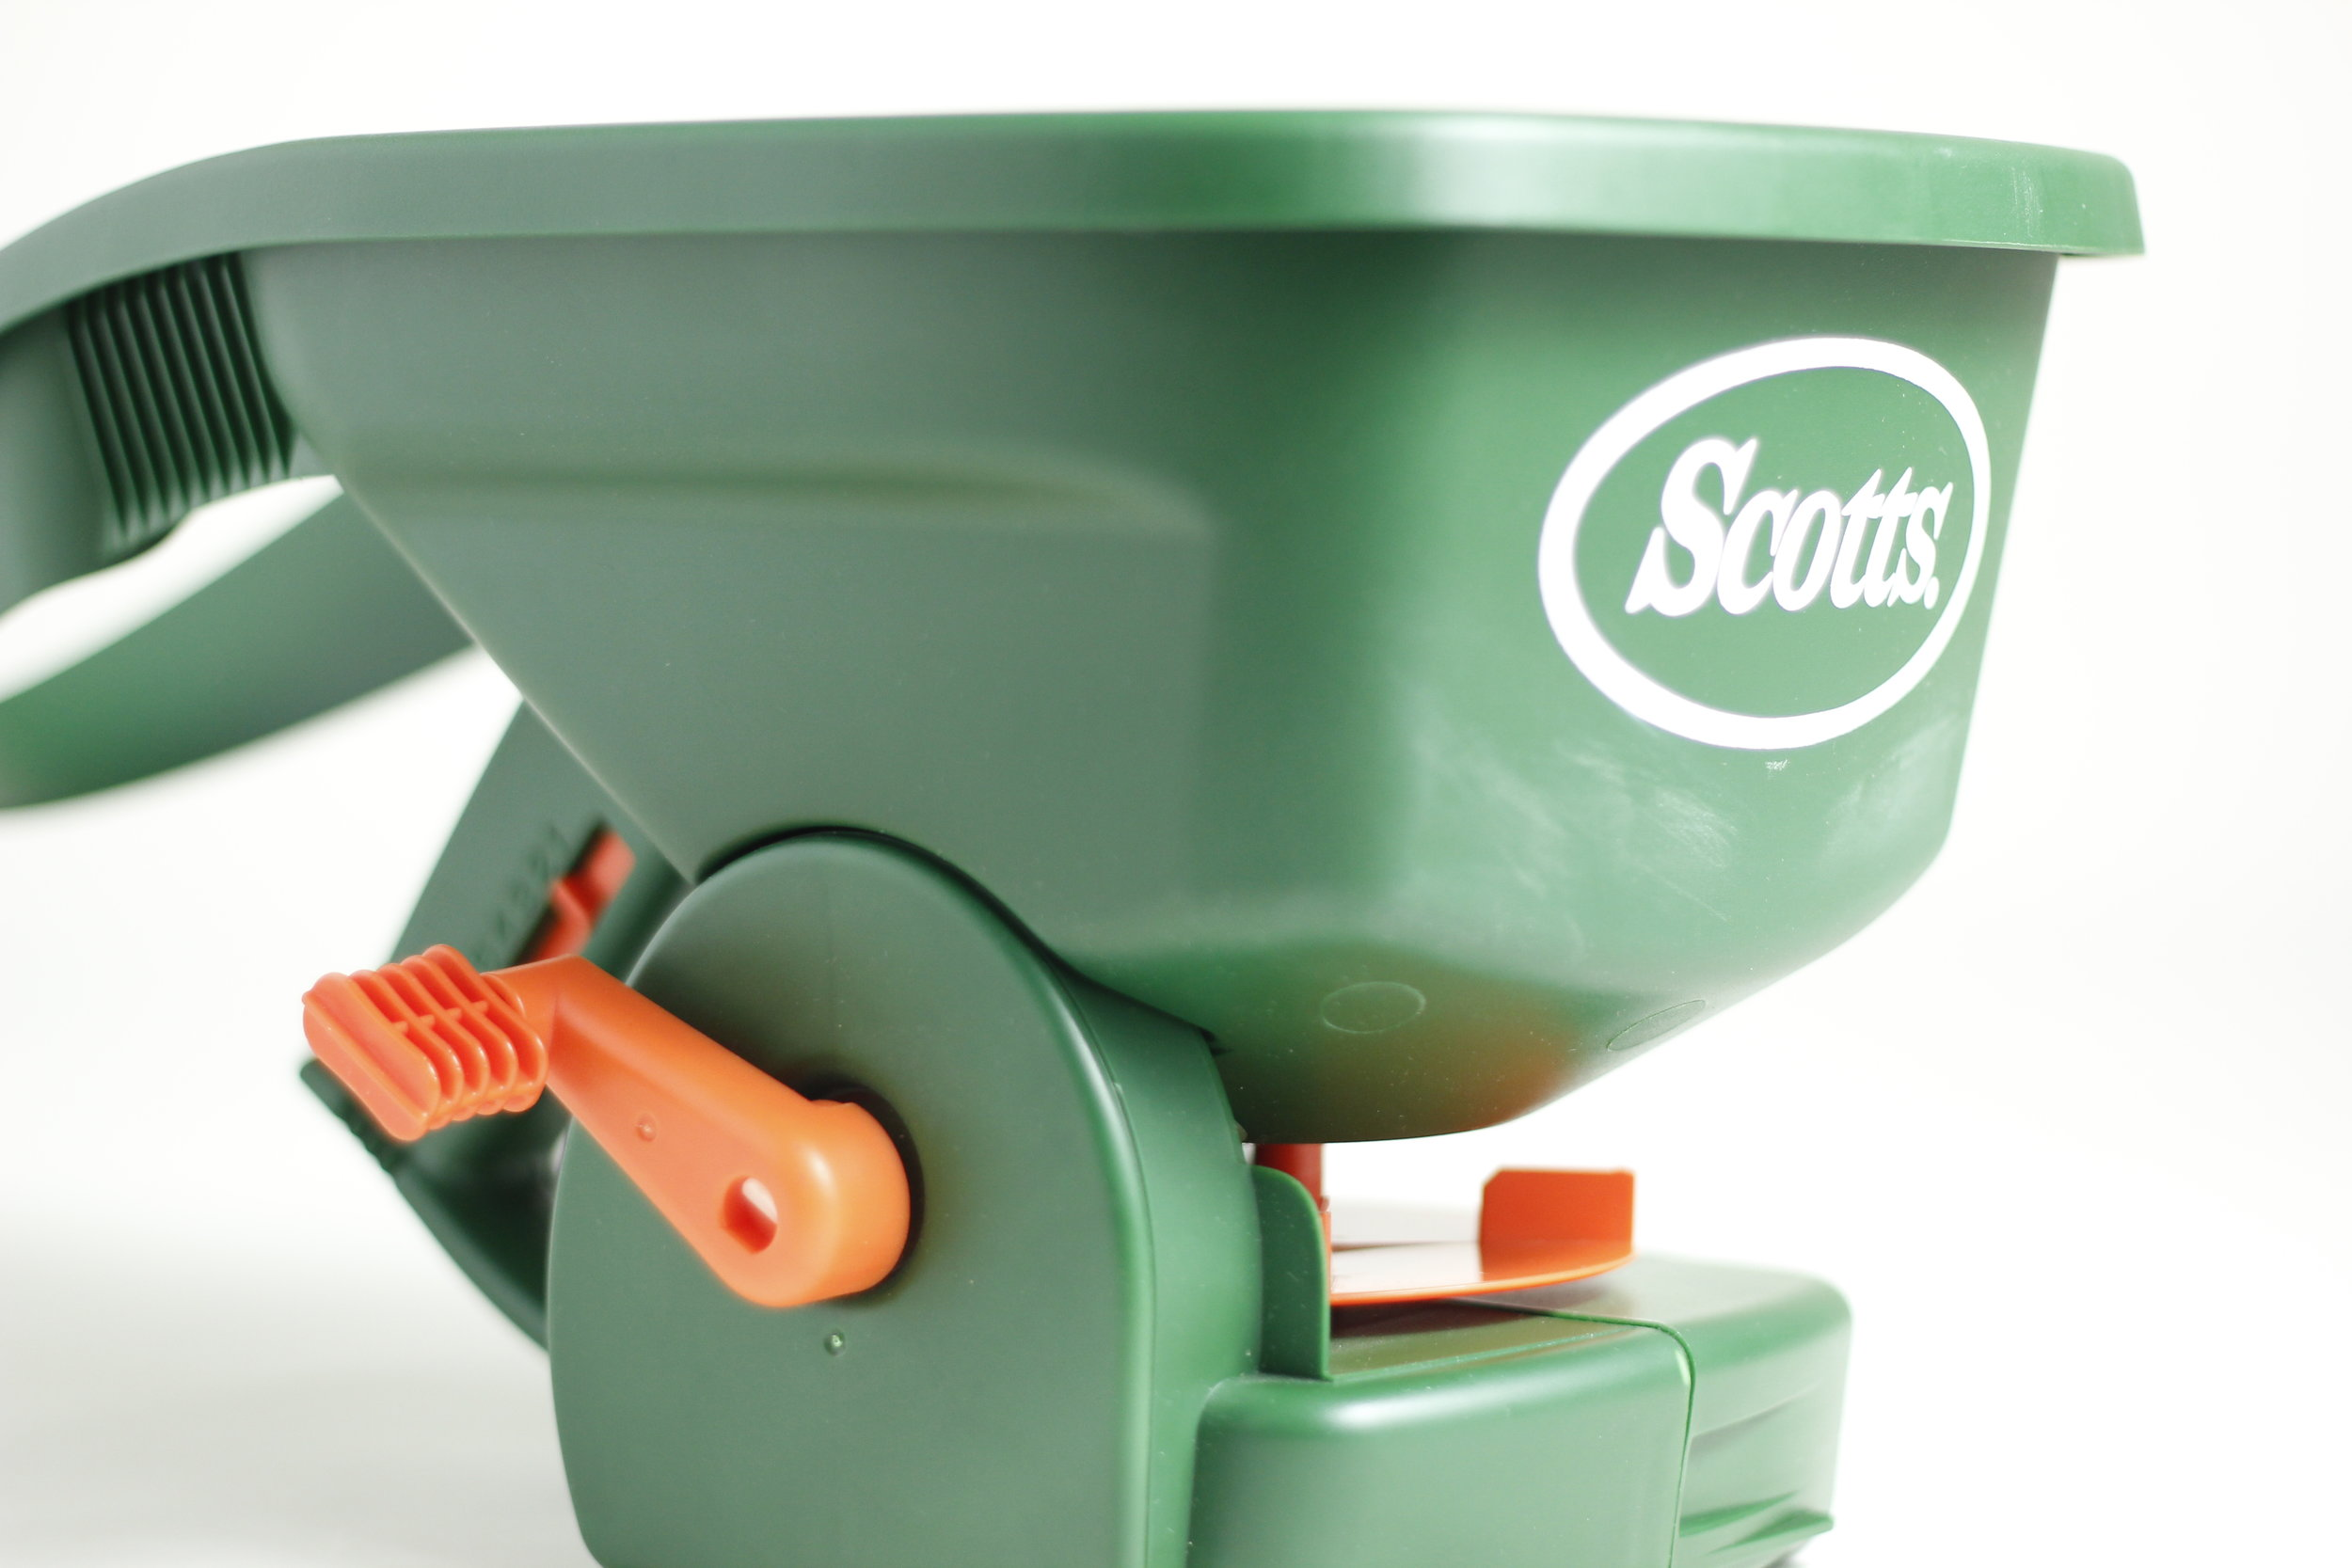 Scotts_Handy Green II Spreader.JPG